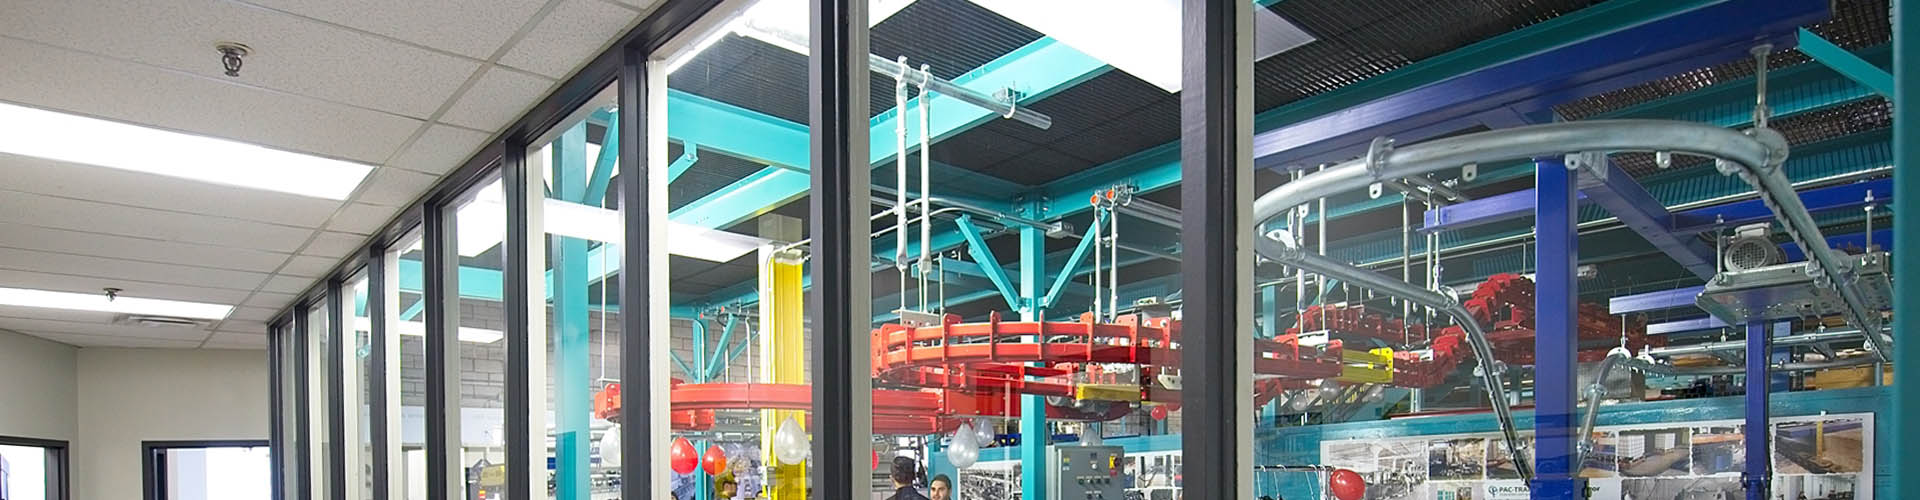 Pacline conveyor testing facility header image